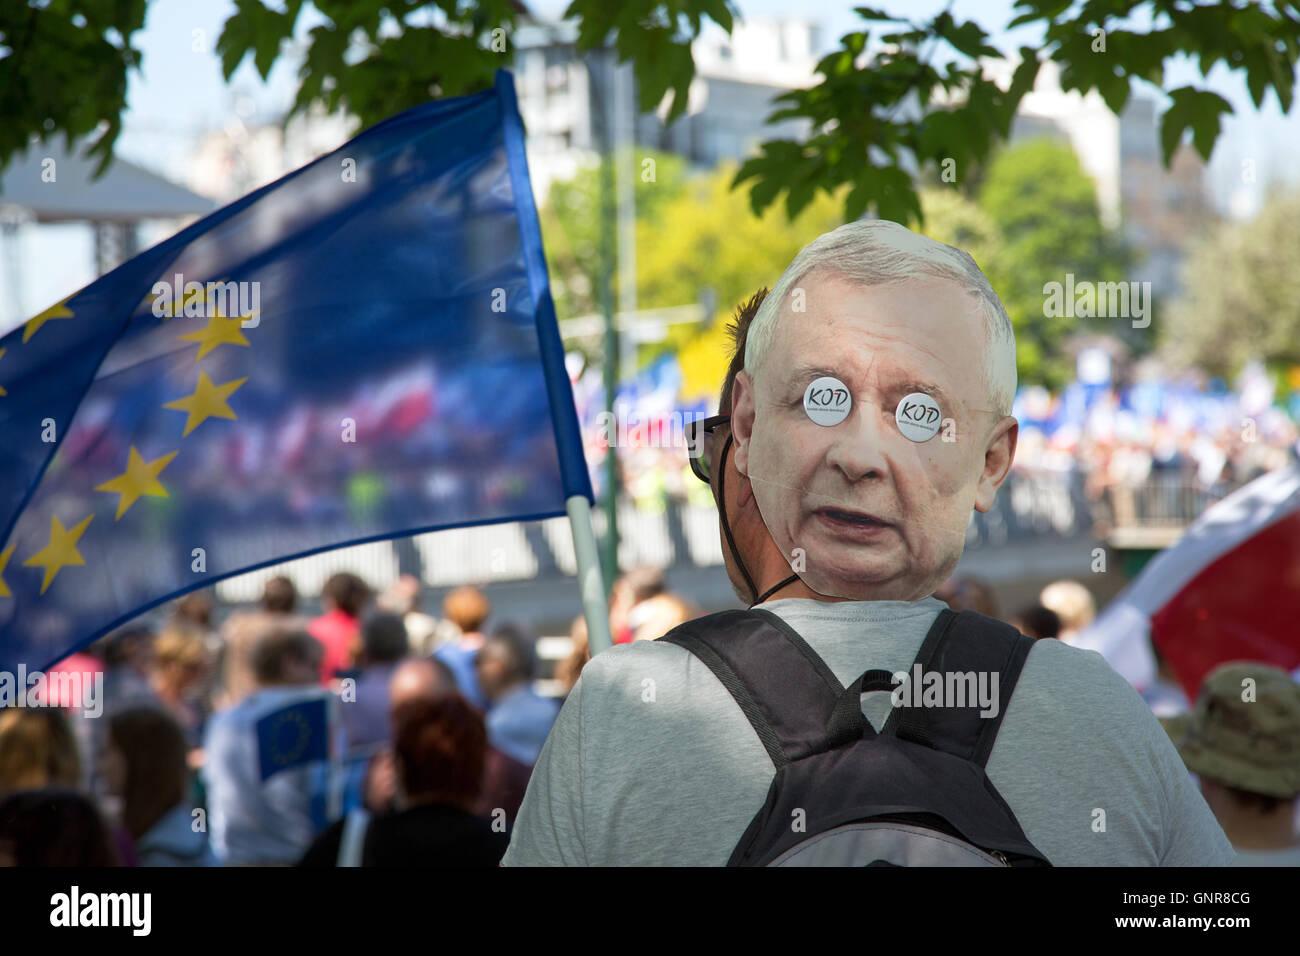 Warsaw, Poland, Protestor with Kaczynski mask at the back - Stock Image